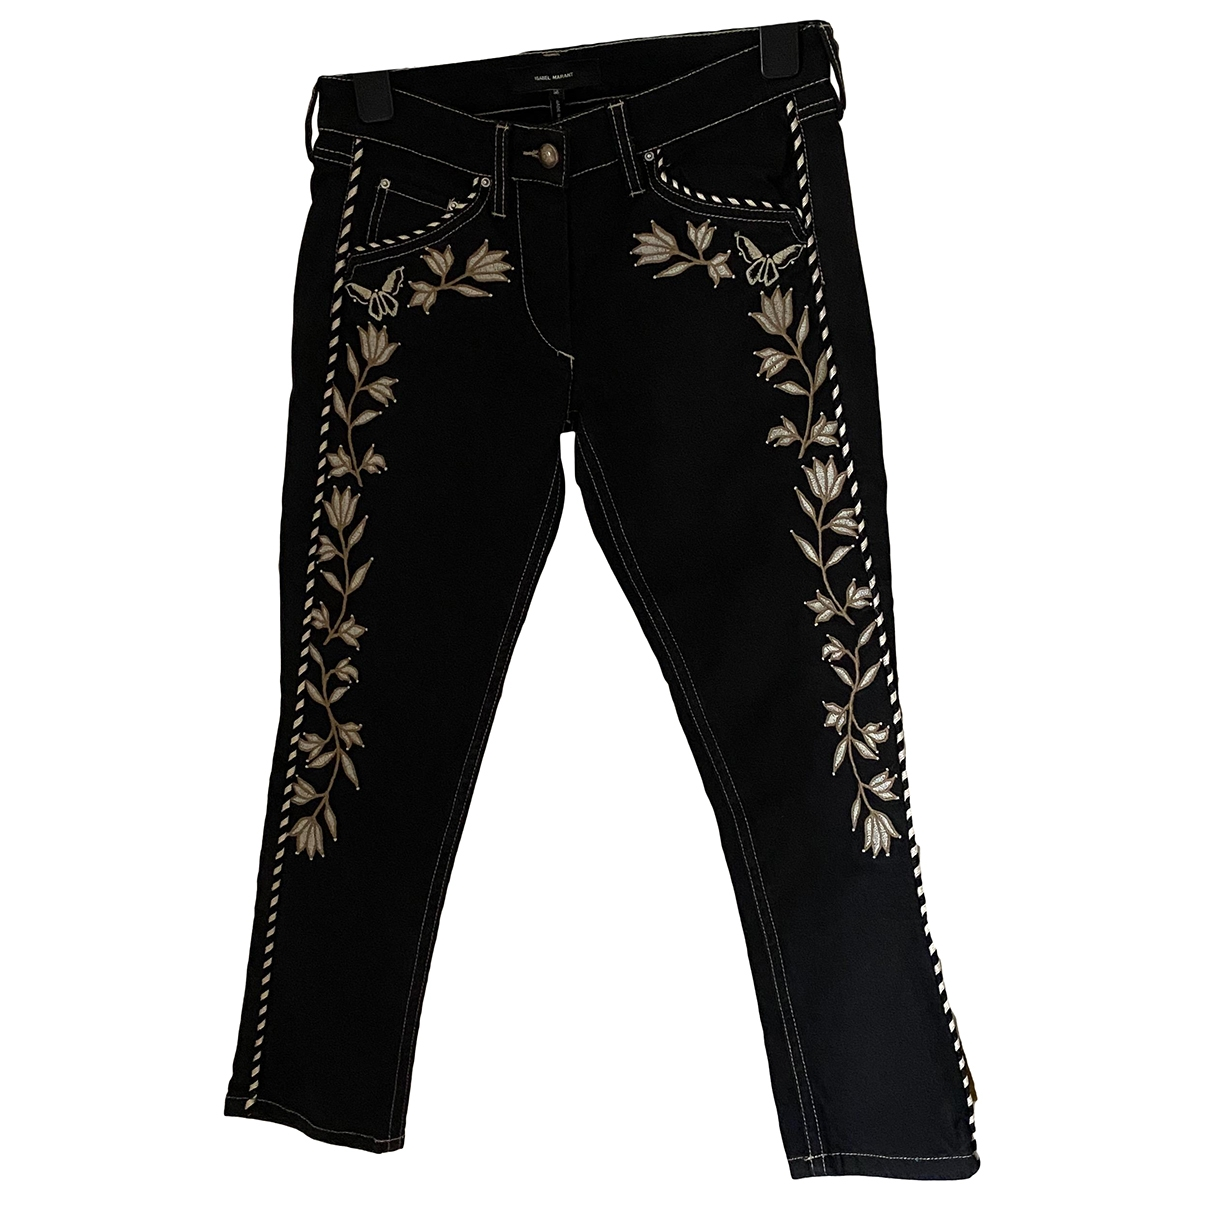 Isabel Marant \N Black Cotton - elasthane Jeans for Women 36 FR